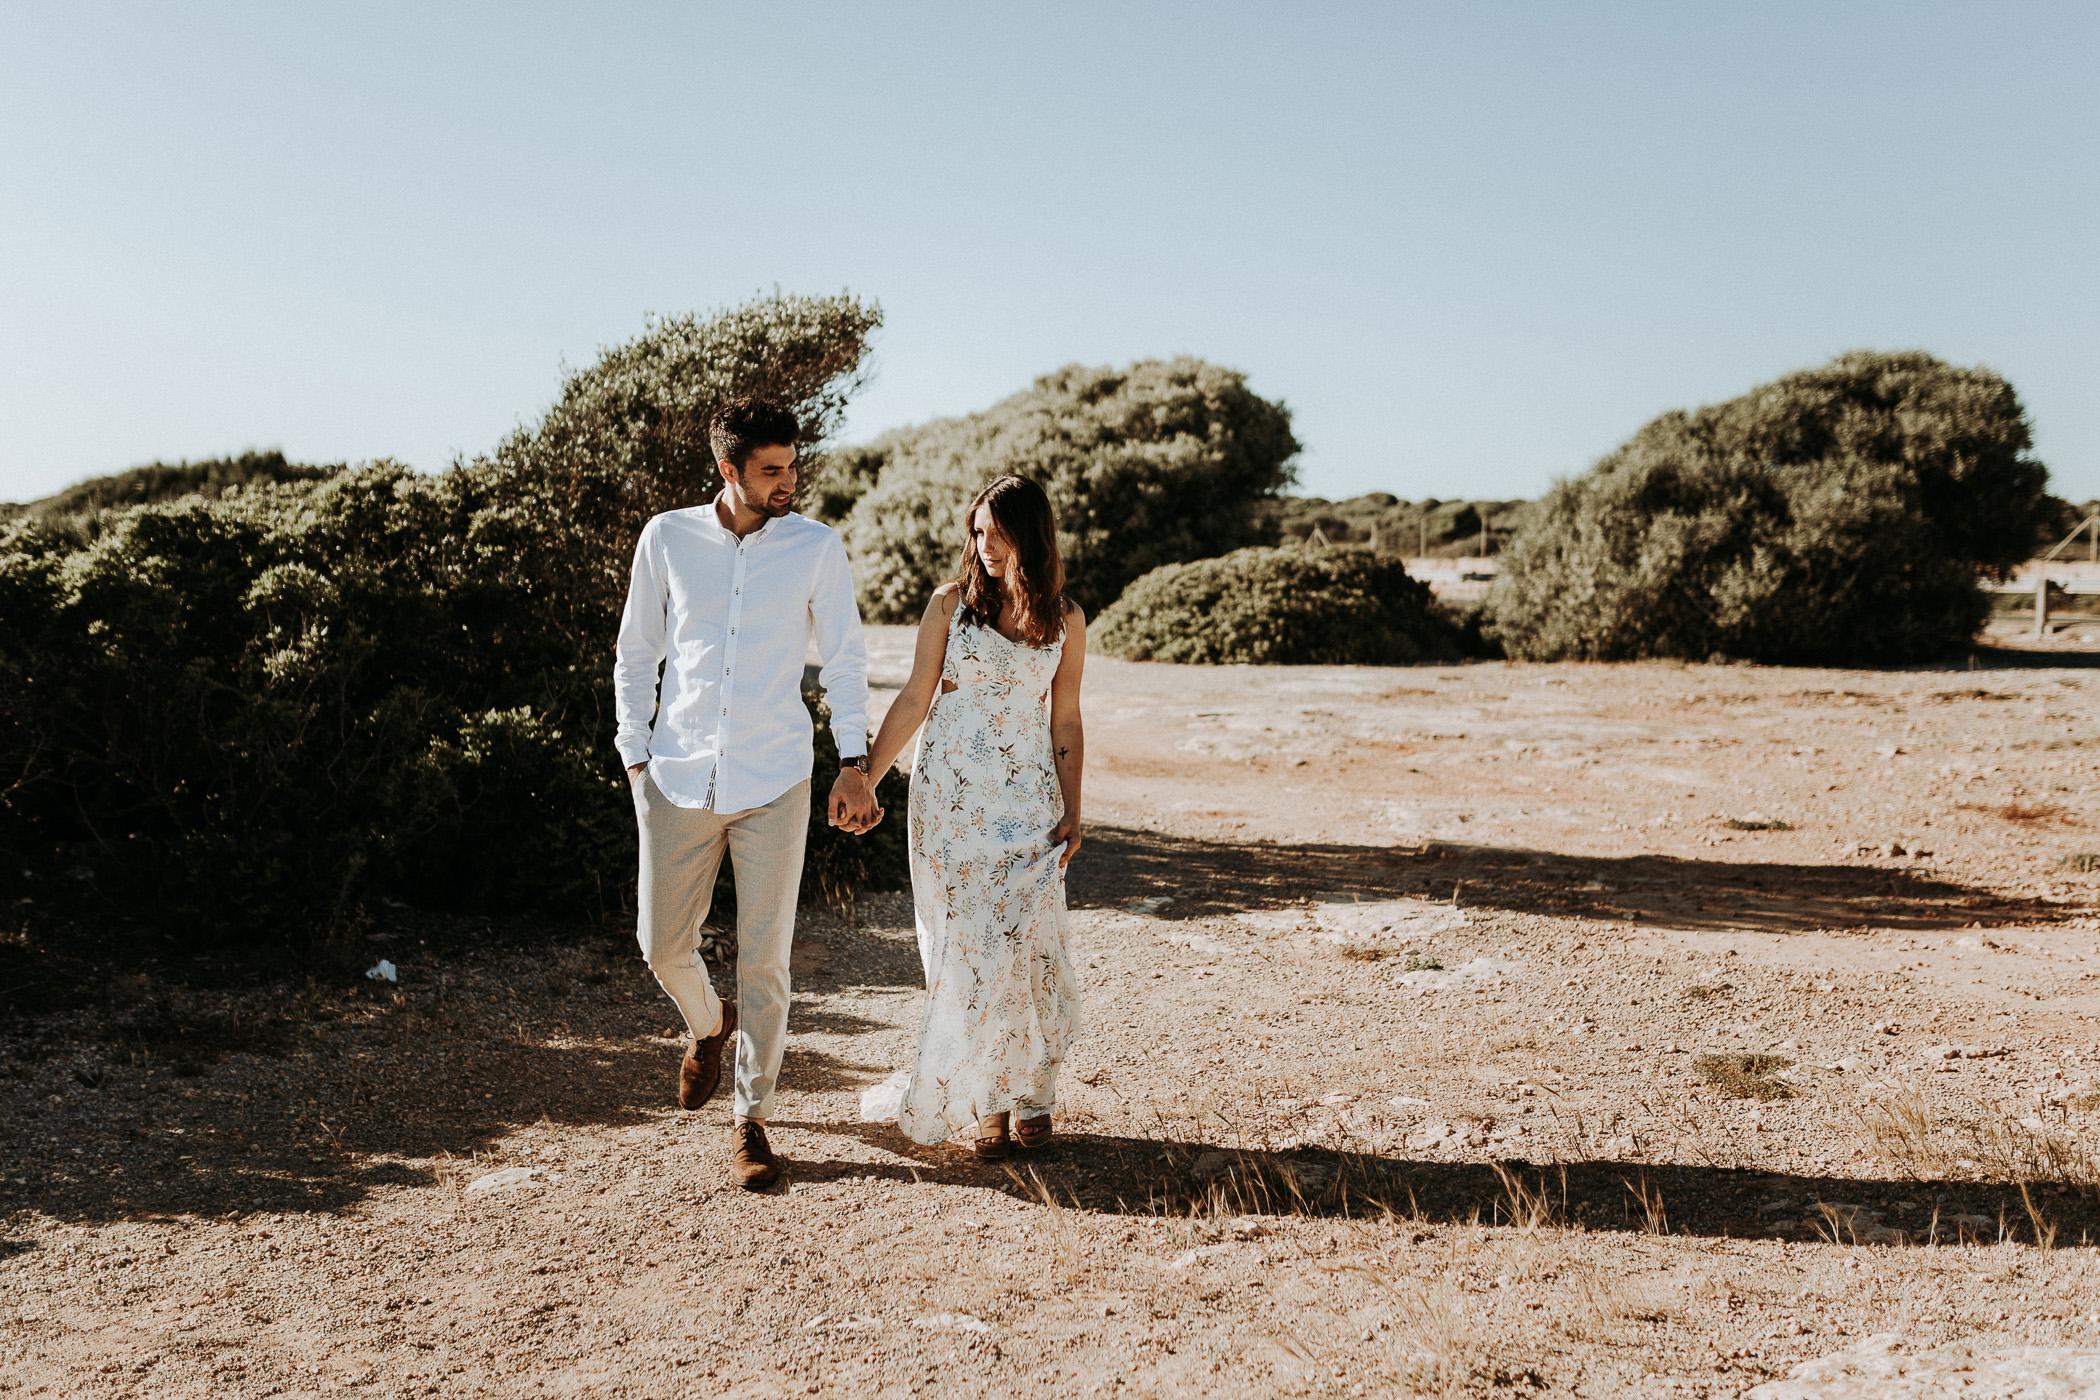 DanielaMarquardtPhotography_wedding_elopement_mallorca_spain_calapi_palma_lauraandtoni_8